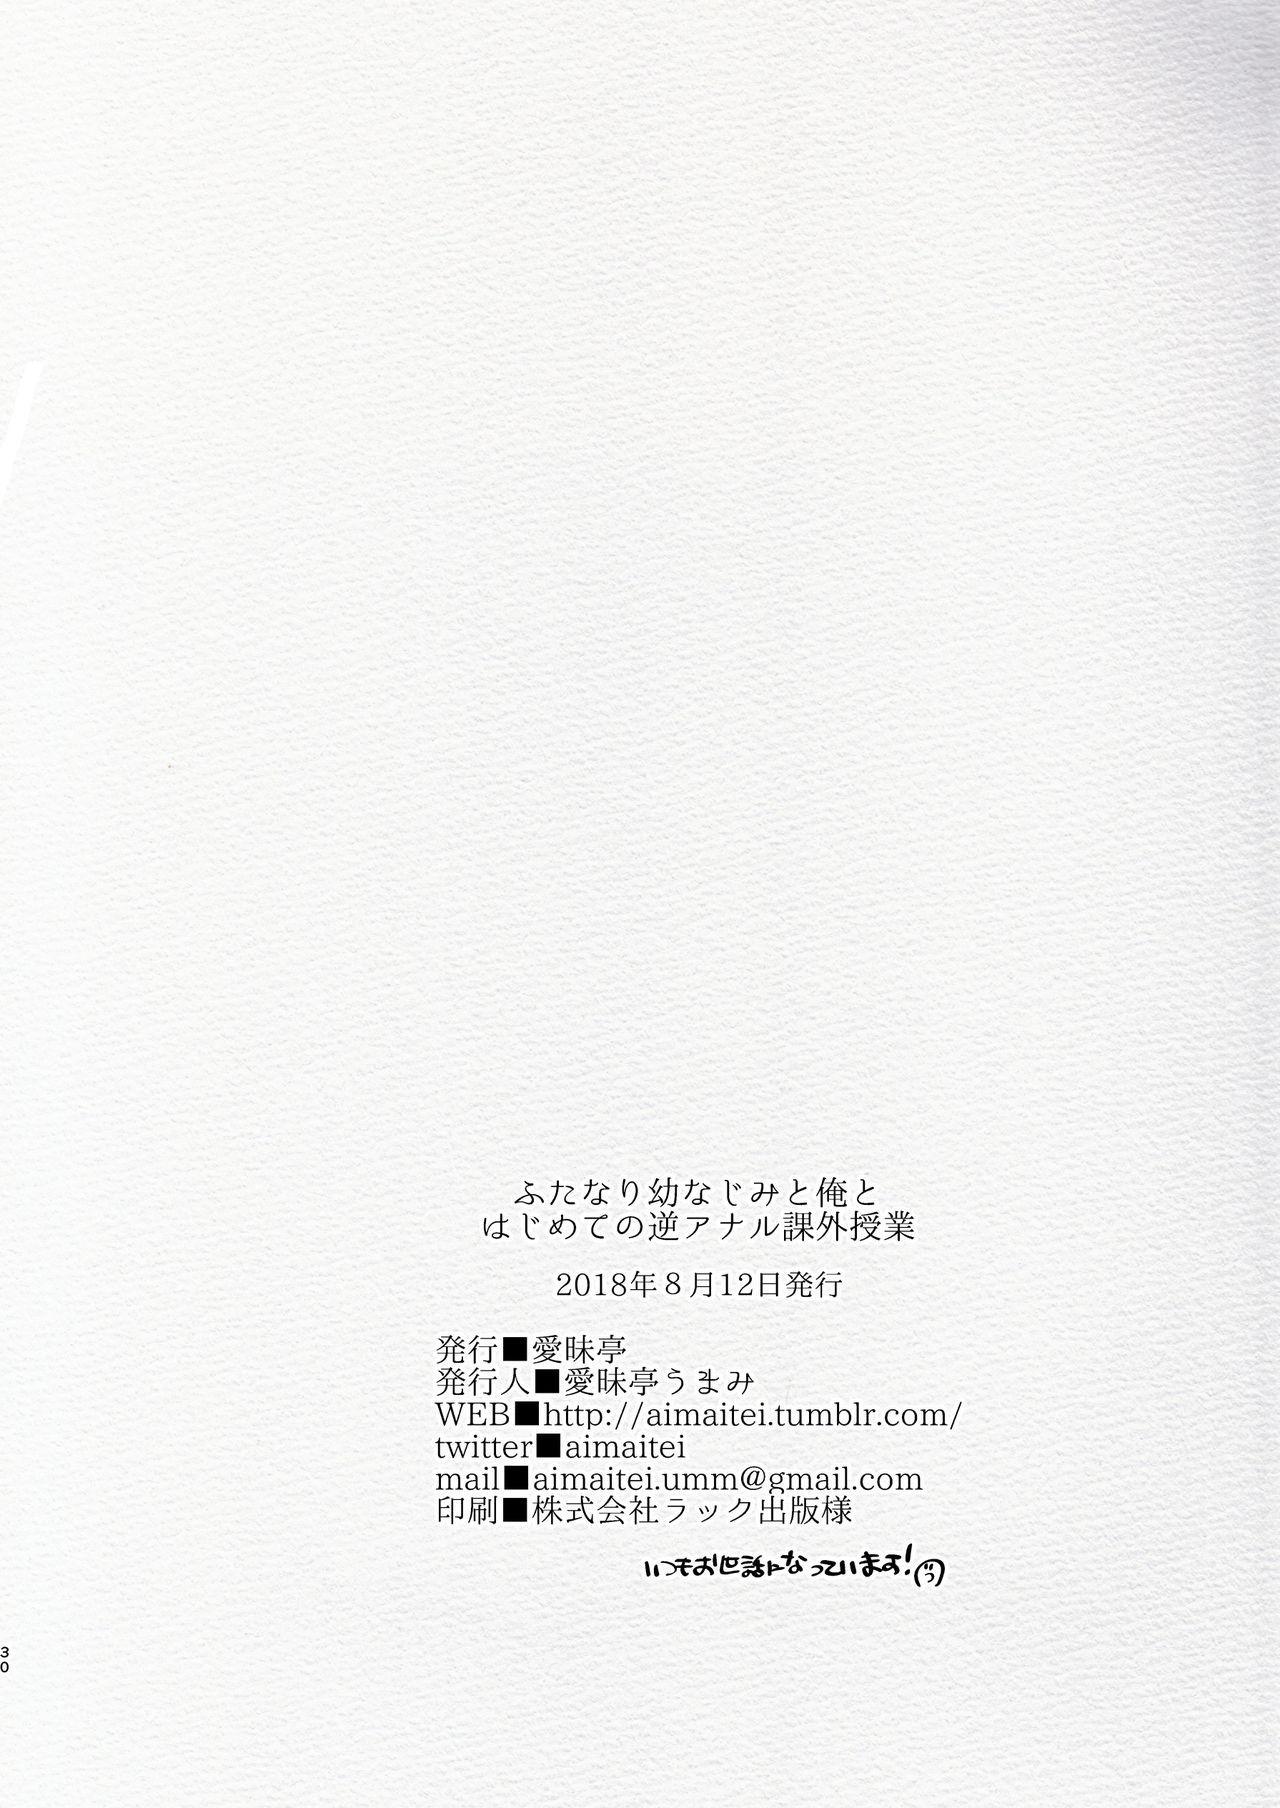 Futanari Osananajimi to Ore to Hajimete no Gyaku Anal Kagai Jugyou 丨扶她青梅竹馬和我第一次的反向小穴做愛課外授課 30